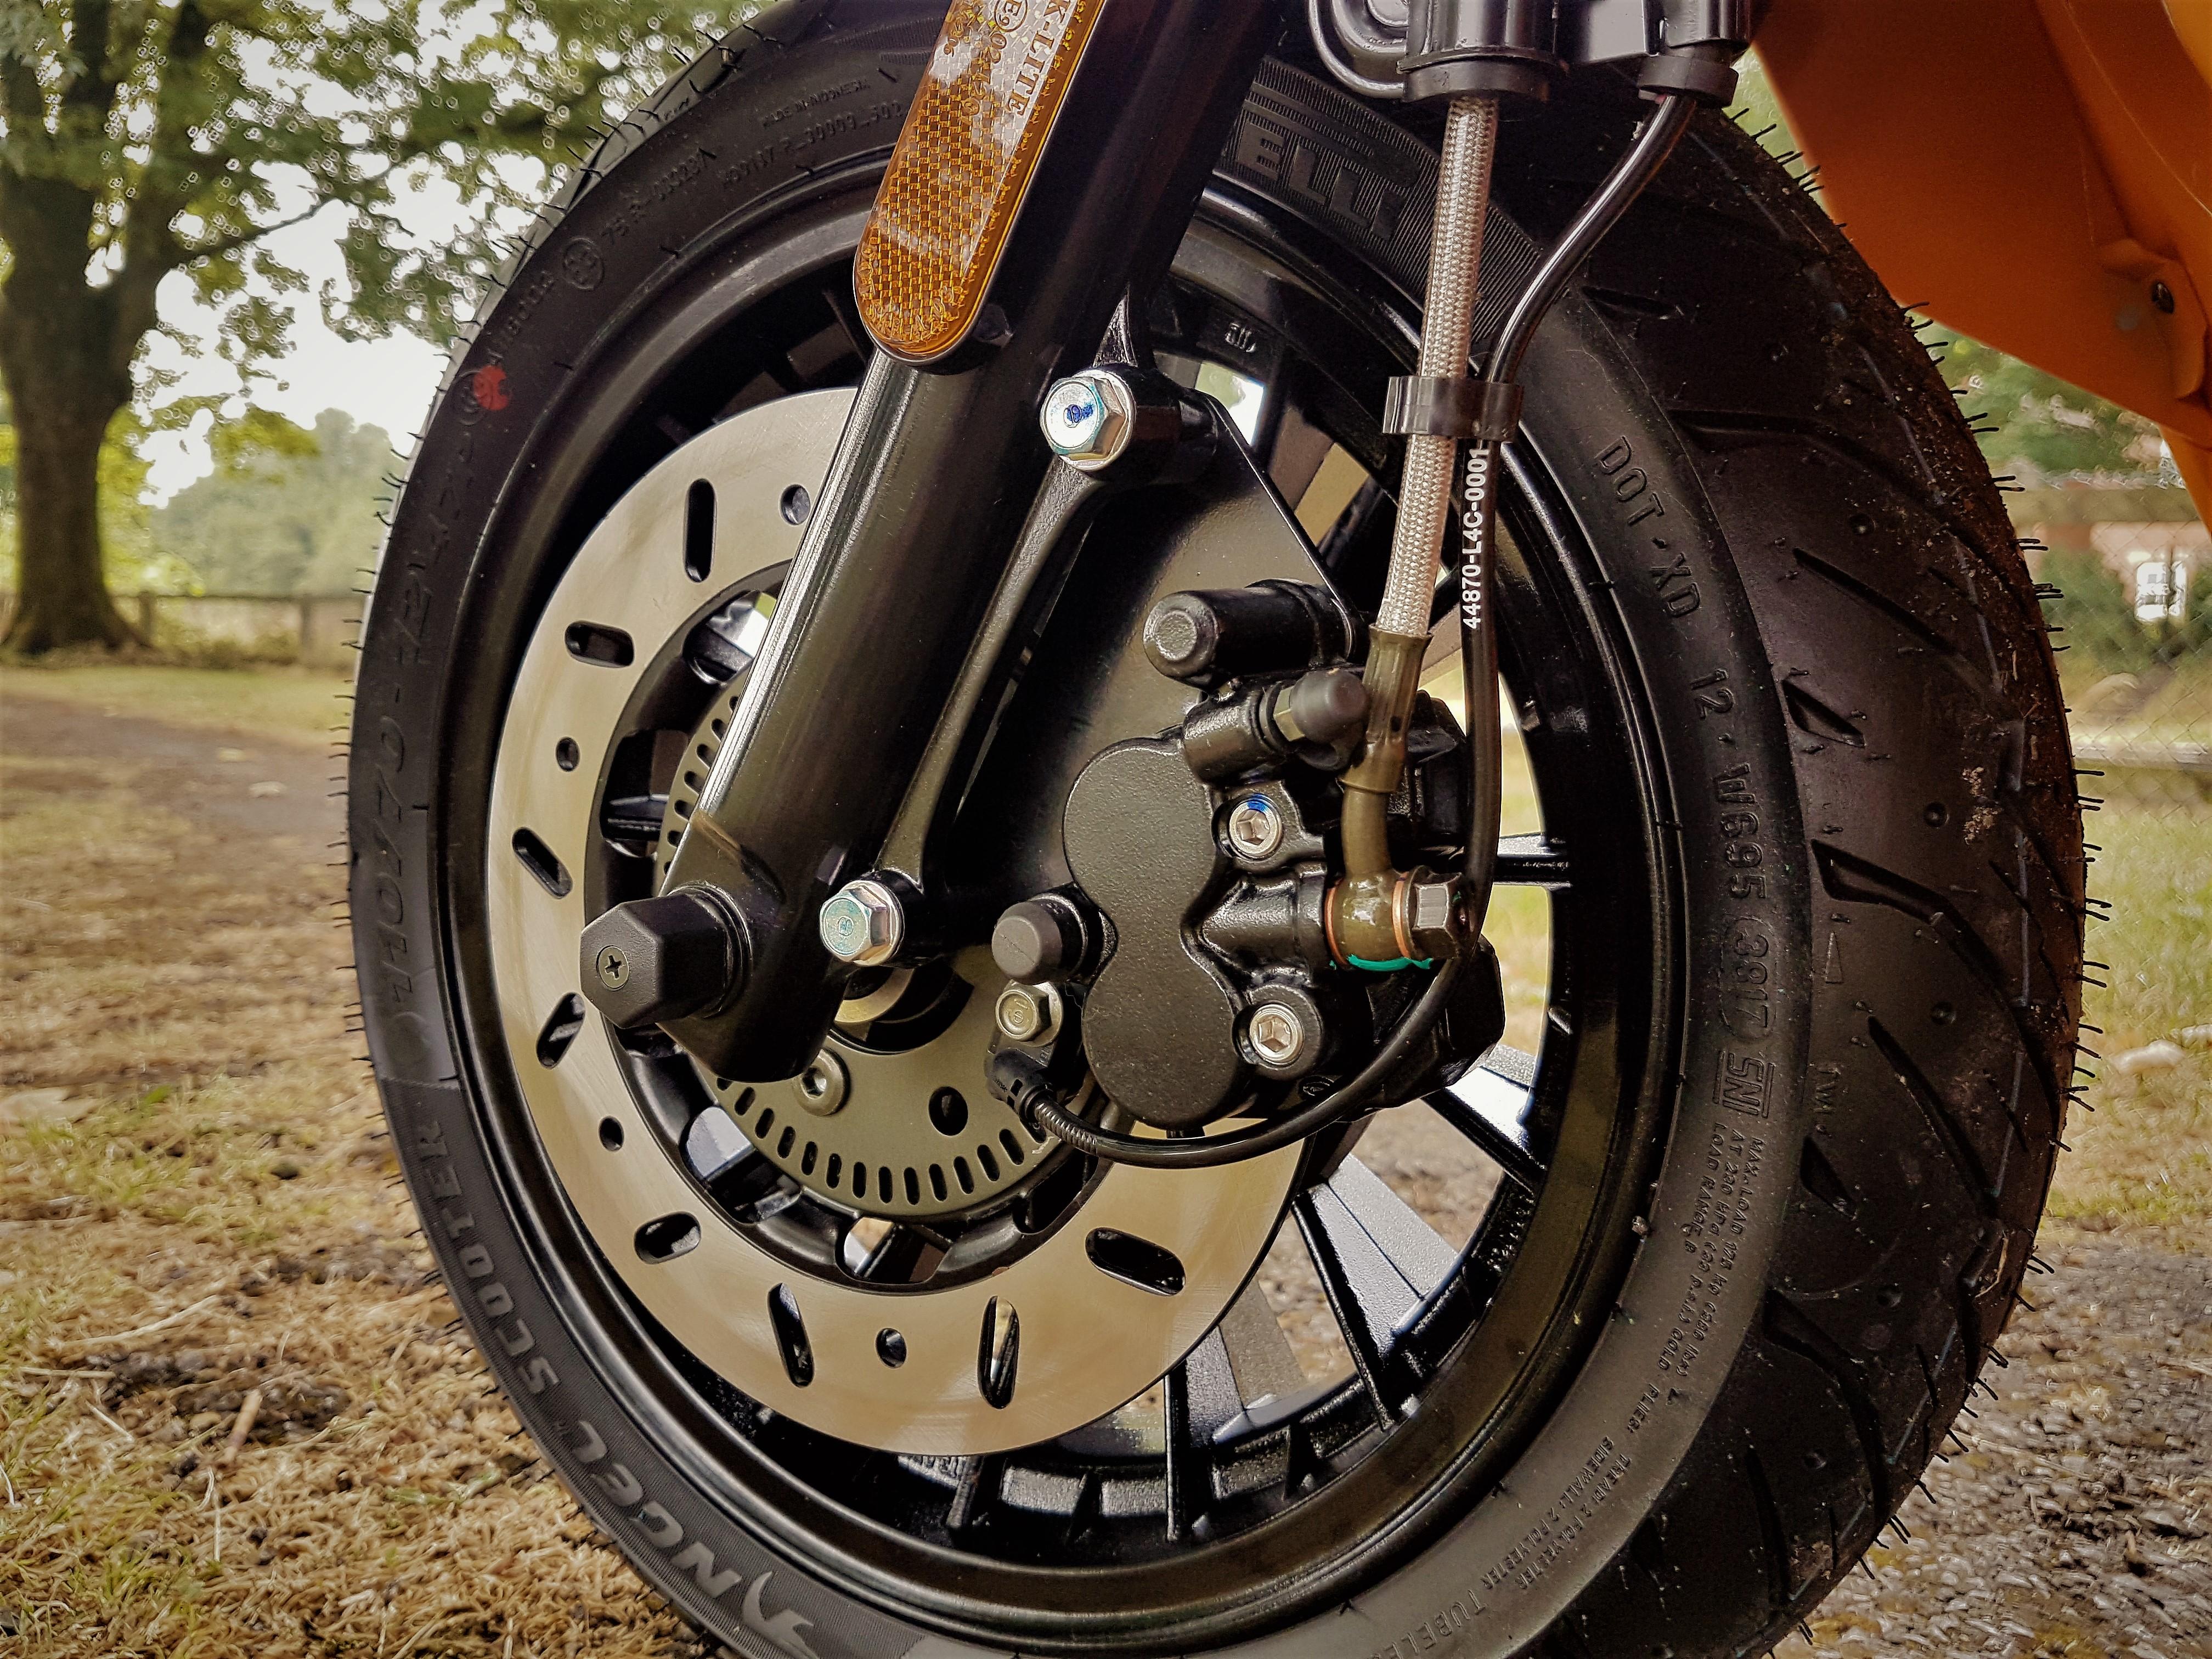 ABS Disc Brake